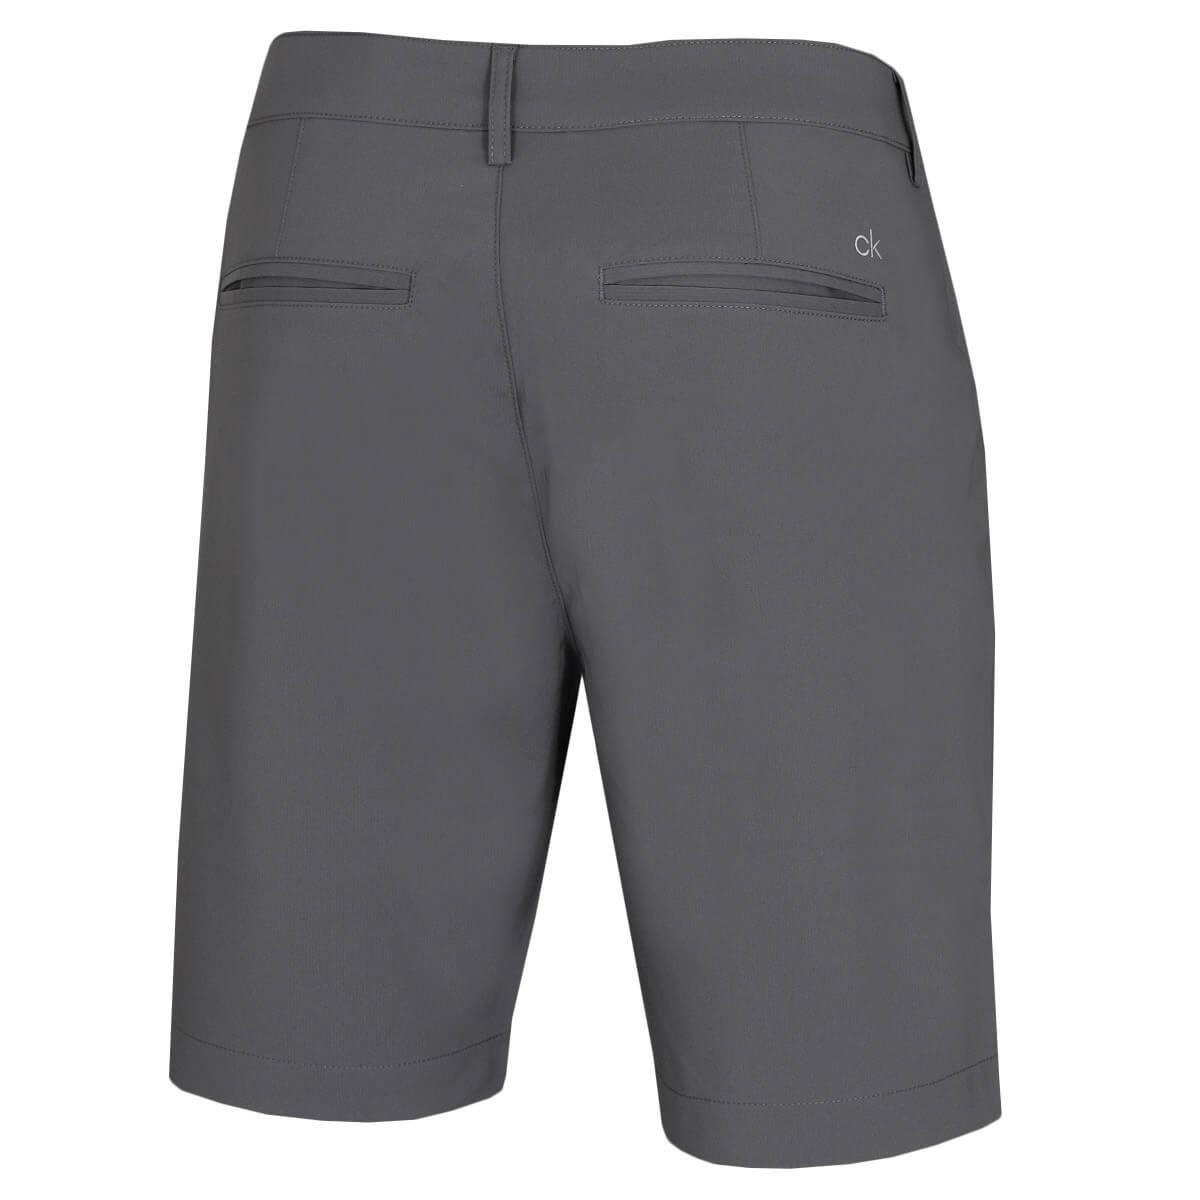 thumbnail 24 - Calvin Klein Mens 2021 Slim Fit Micro Tech Lightweight Golf Shorts 34% OFF RRP